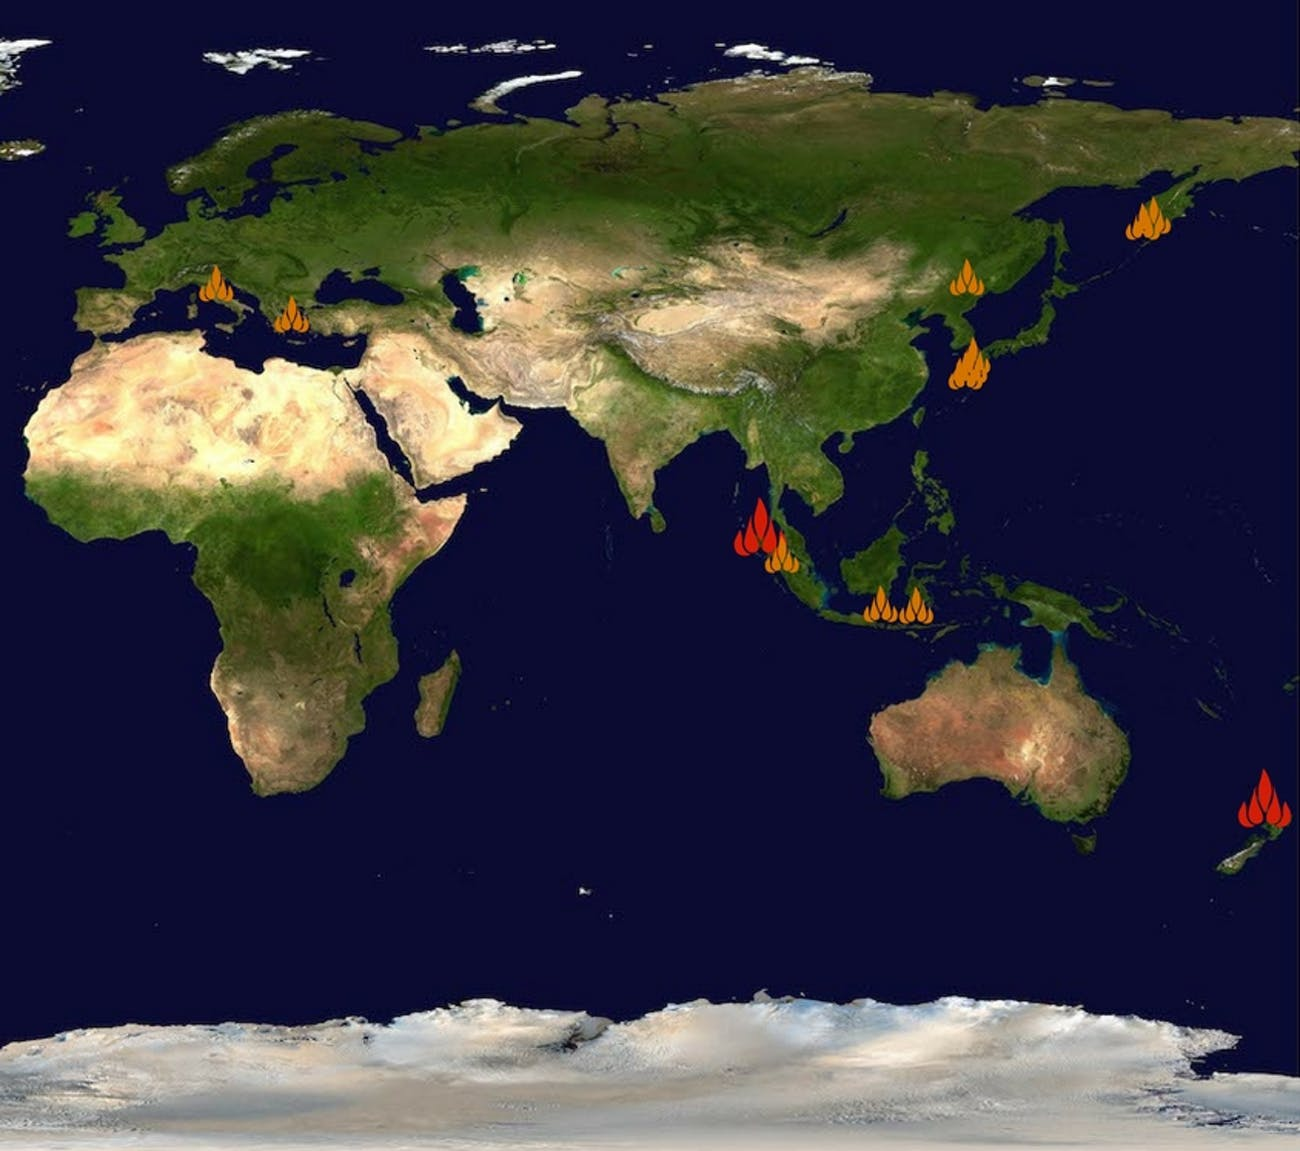 Supervolcanoes Around The World Map on nostradamus world map, volcanoes world map, climate change world map, magma world map, koopalings world map, oceans world map, yellowstone world map, survival world map, nuclear war world map, super volcano world map, galapagos world map,